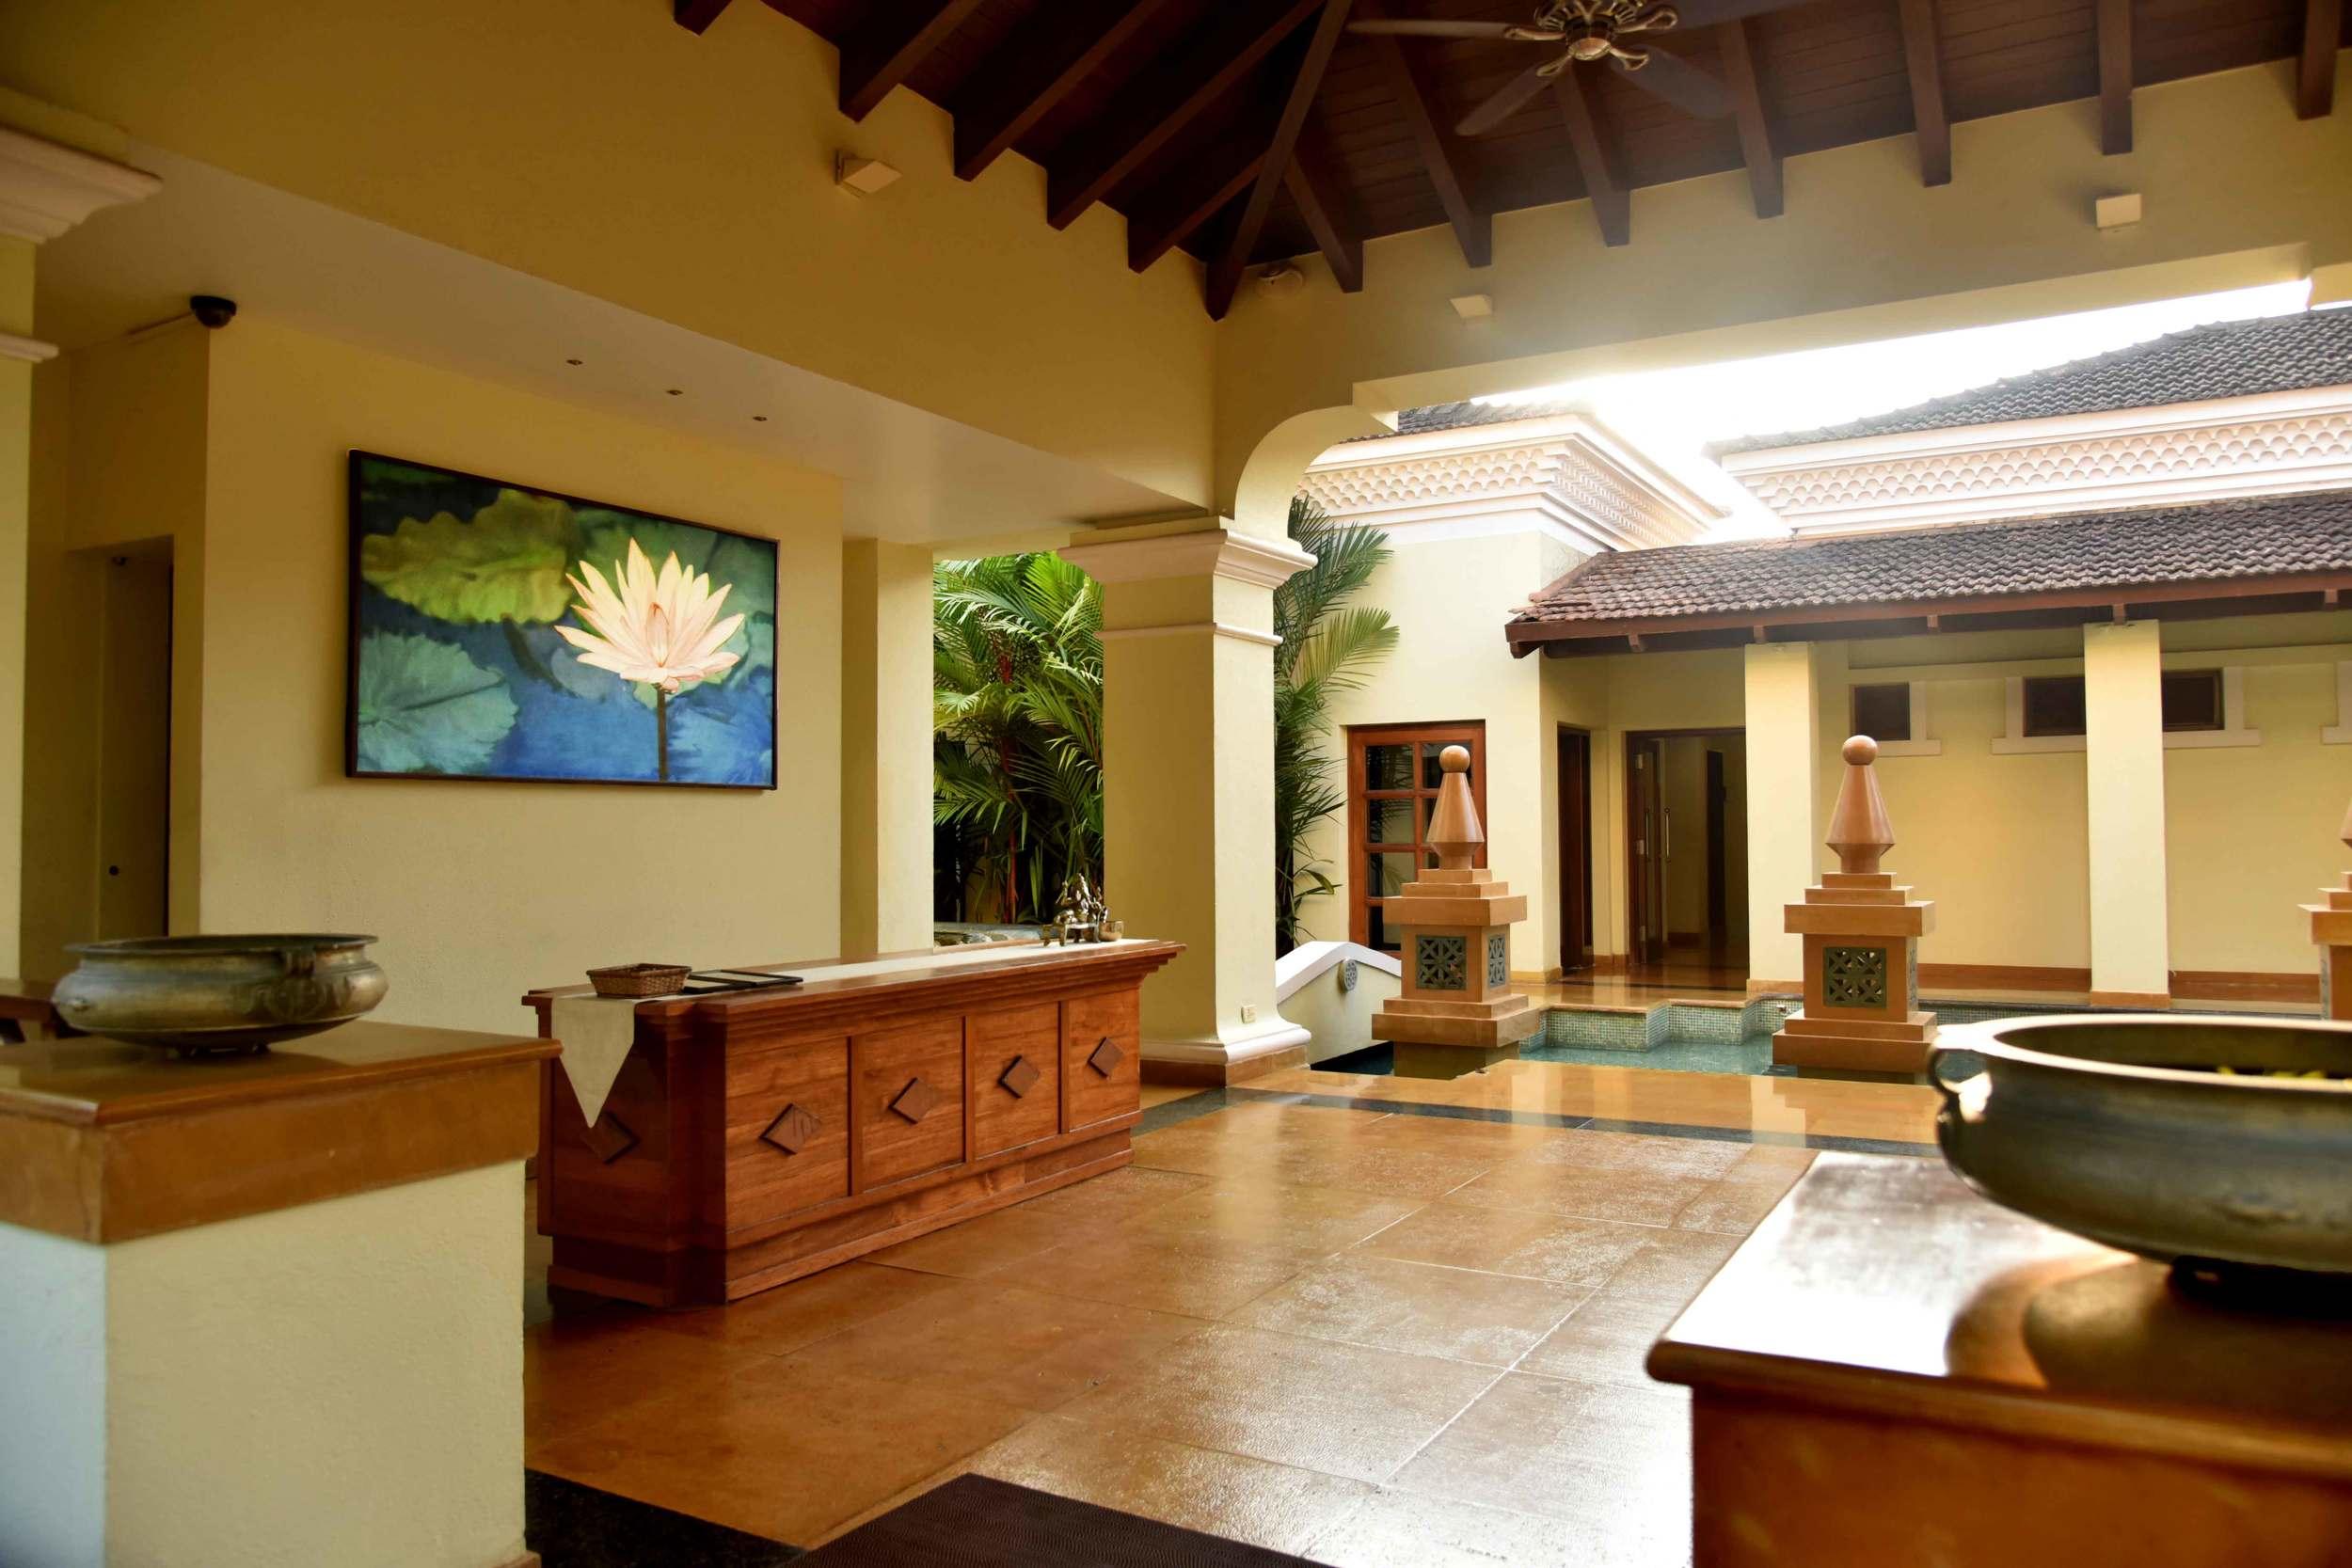 The Sereno Spa, Park Hyatt Hotel, Goa, image©sourcingstyle.com.